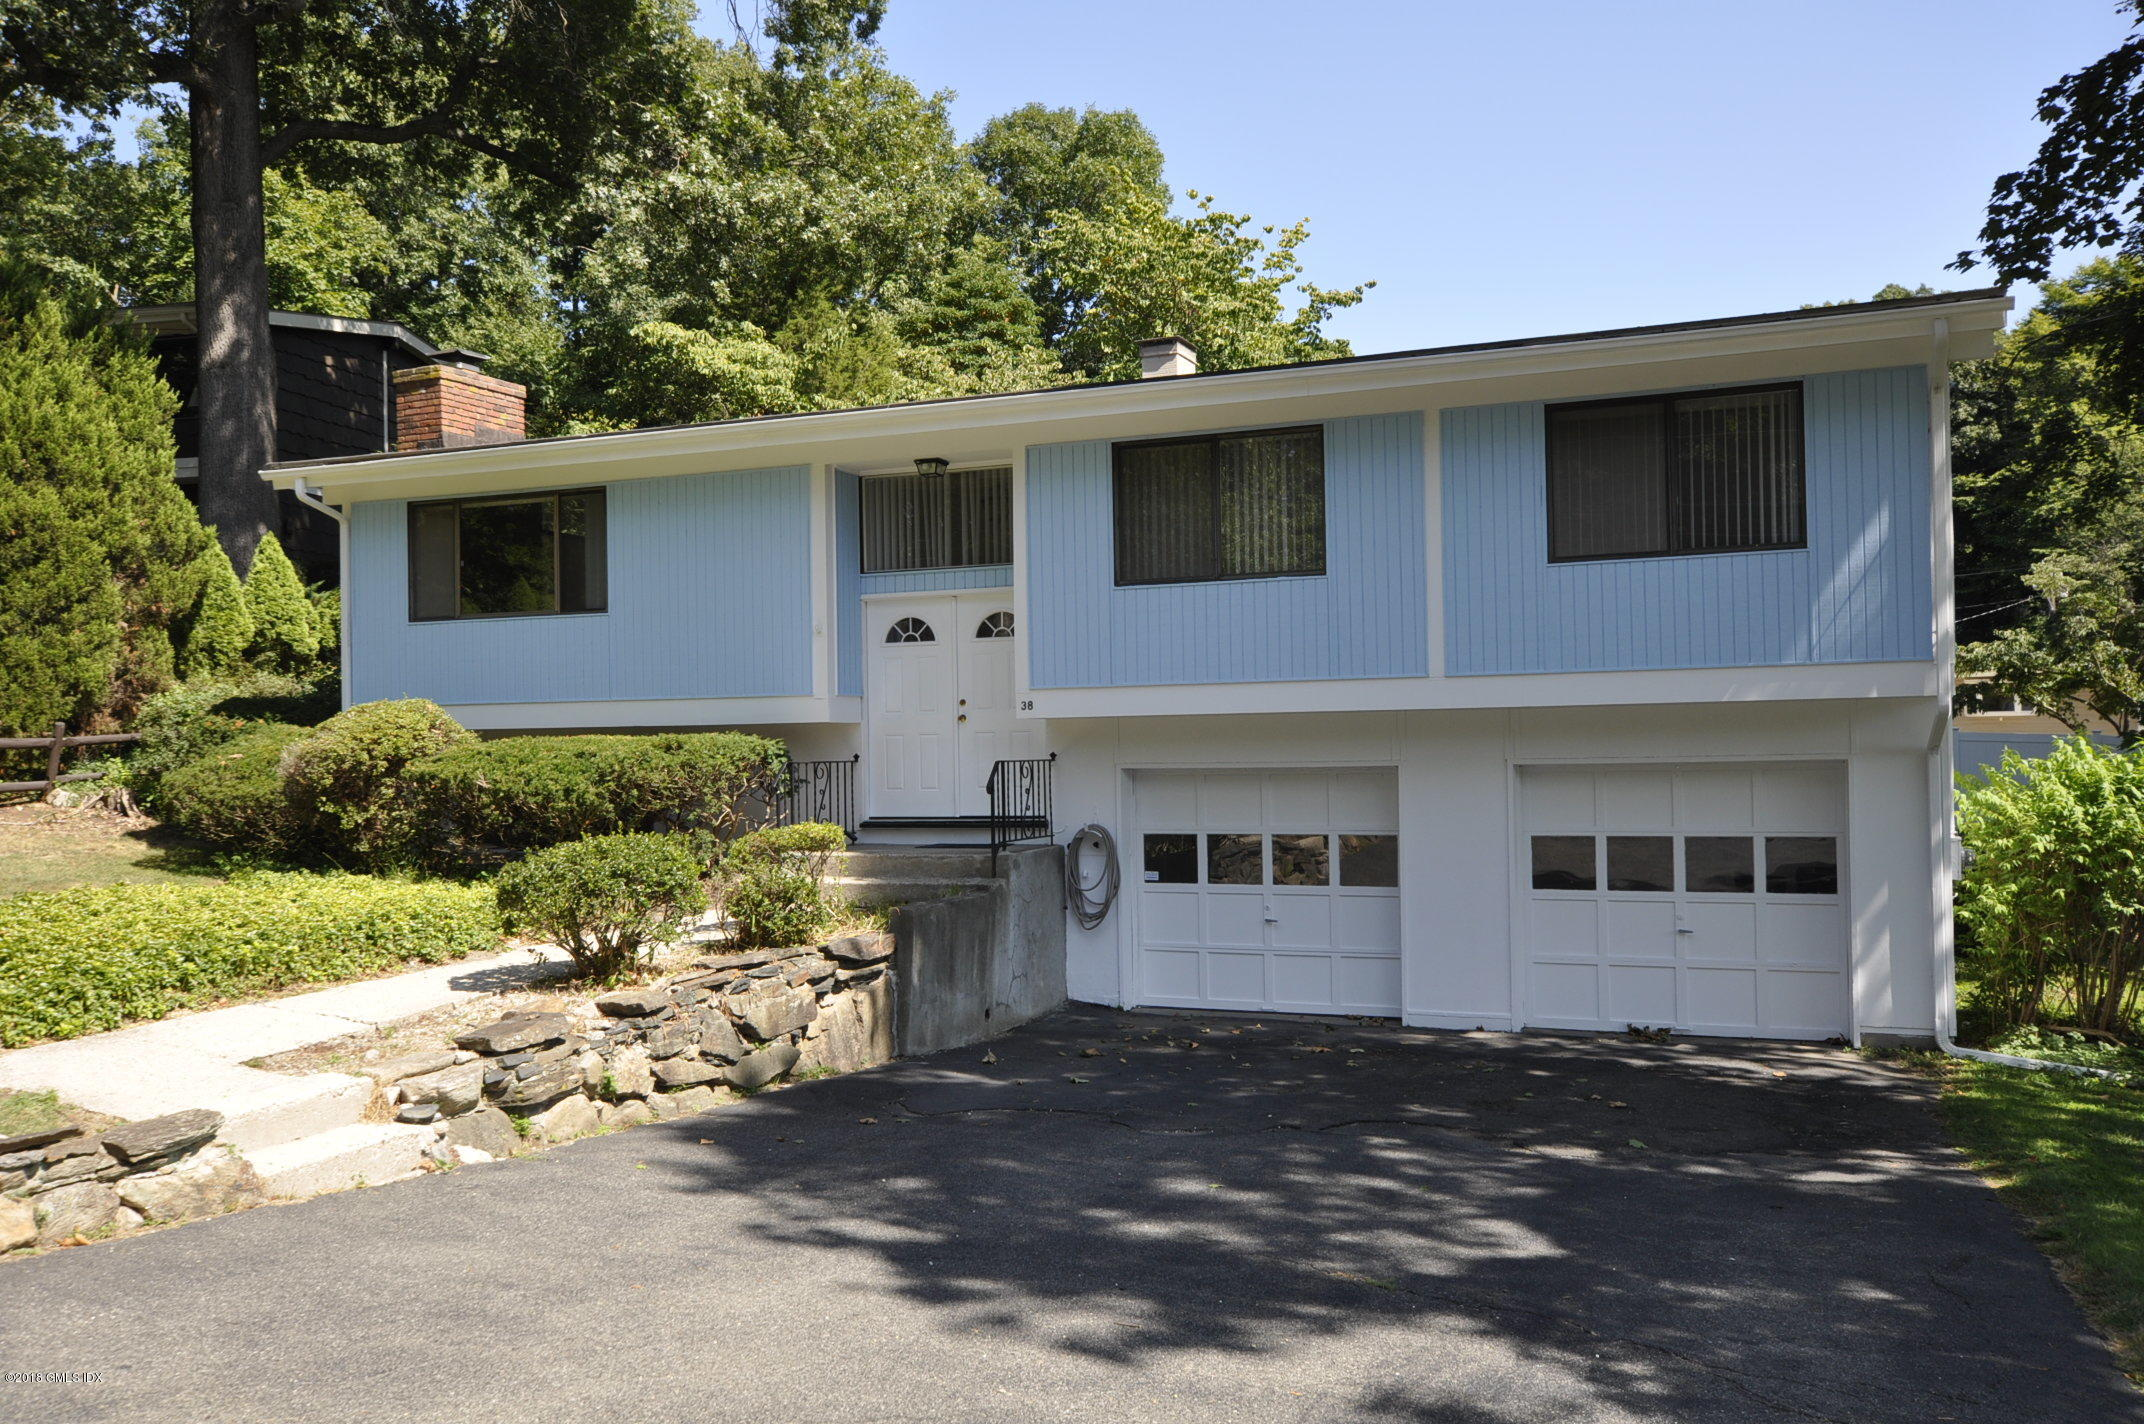 38 Crawford Terrace,Riverside,Connecticut 06878,4 Bedrooms Bedrooms,3 BathroomsBathrooms,Single family,Crawford,105666